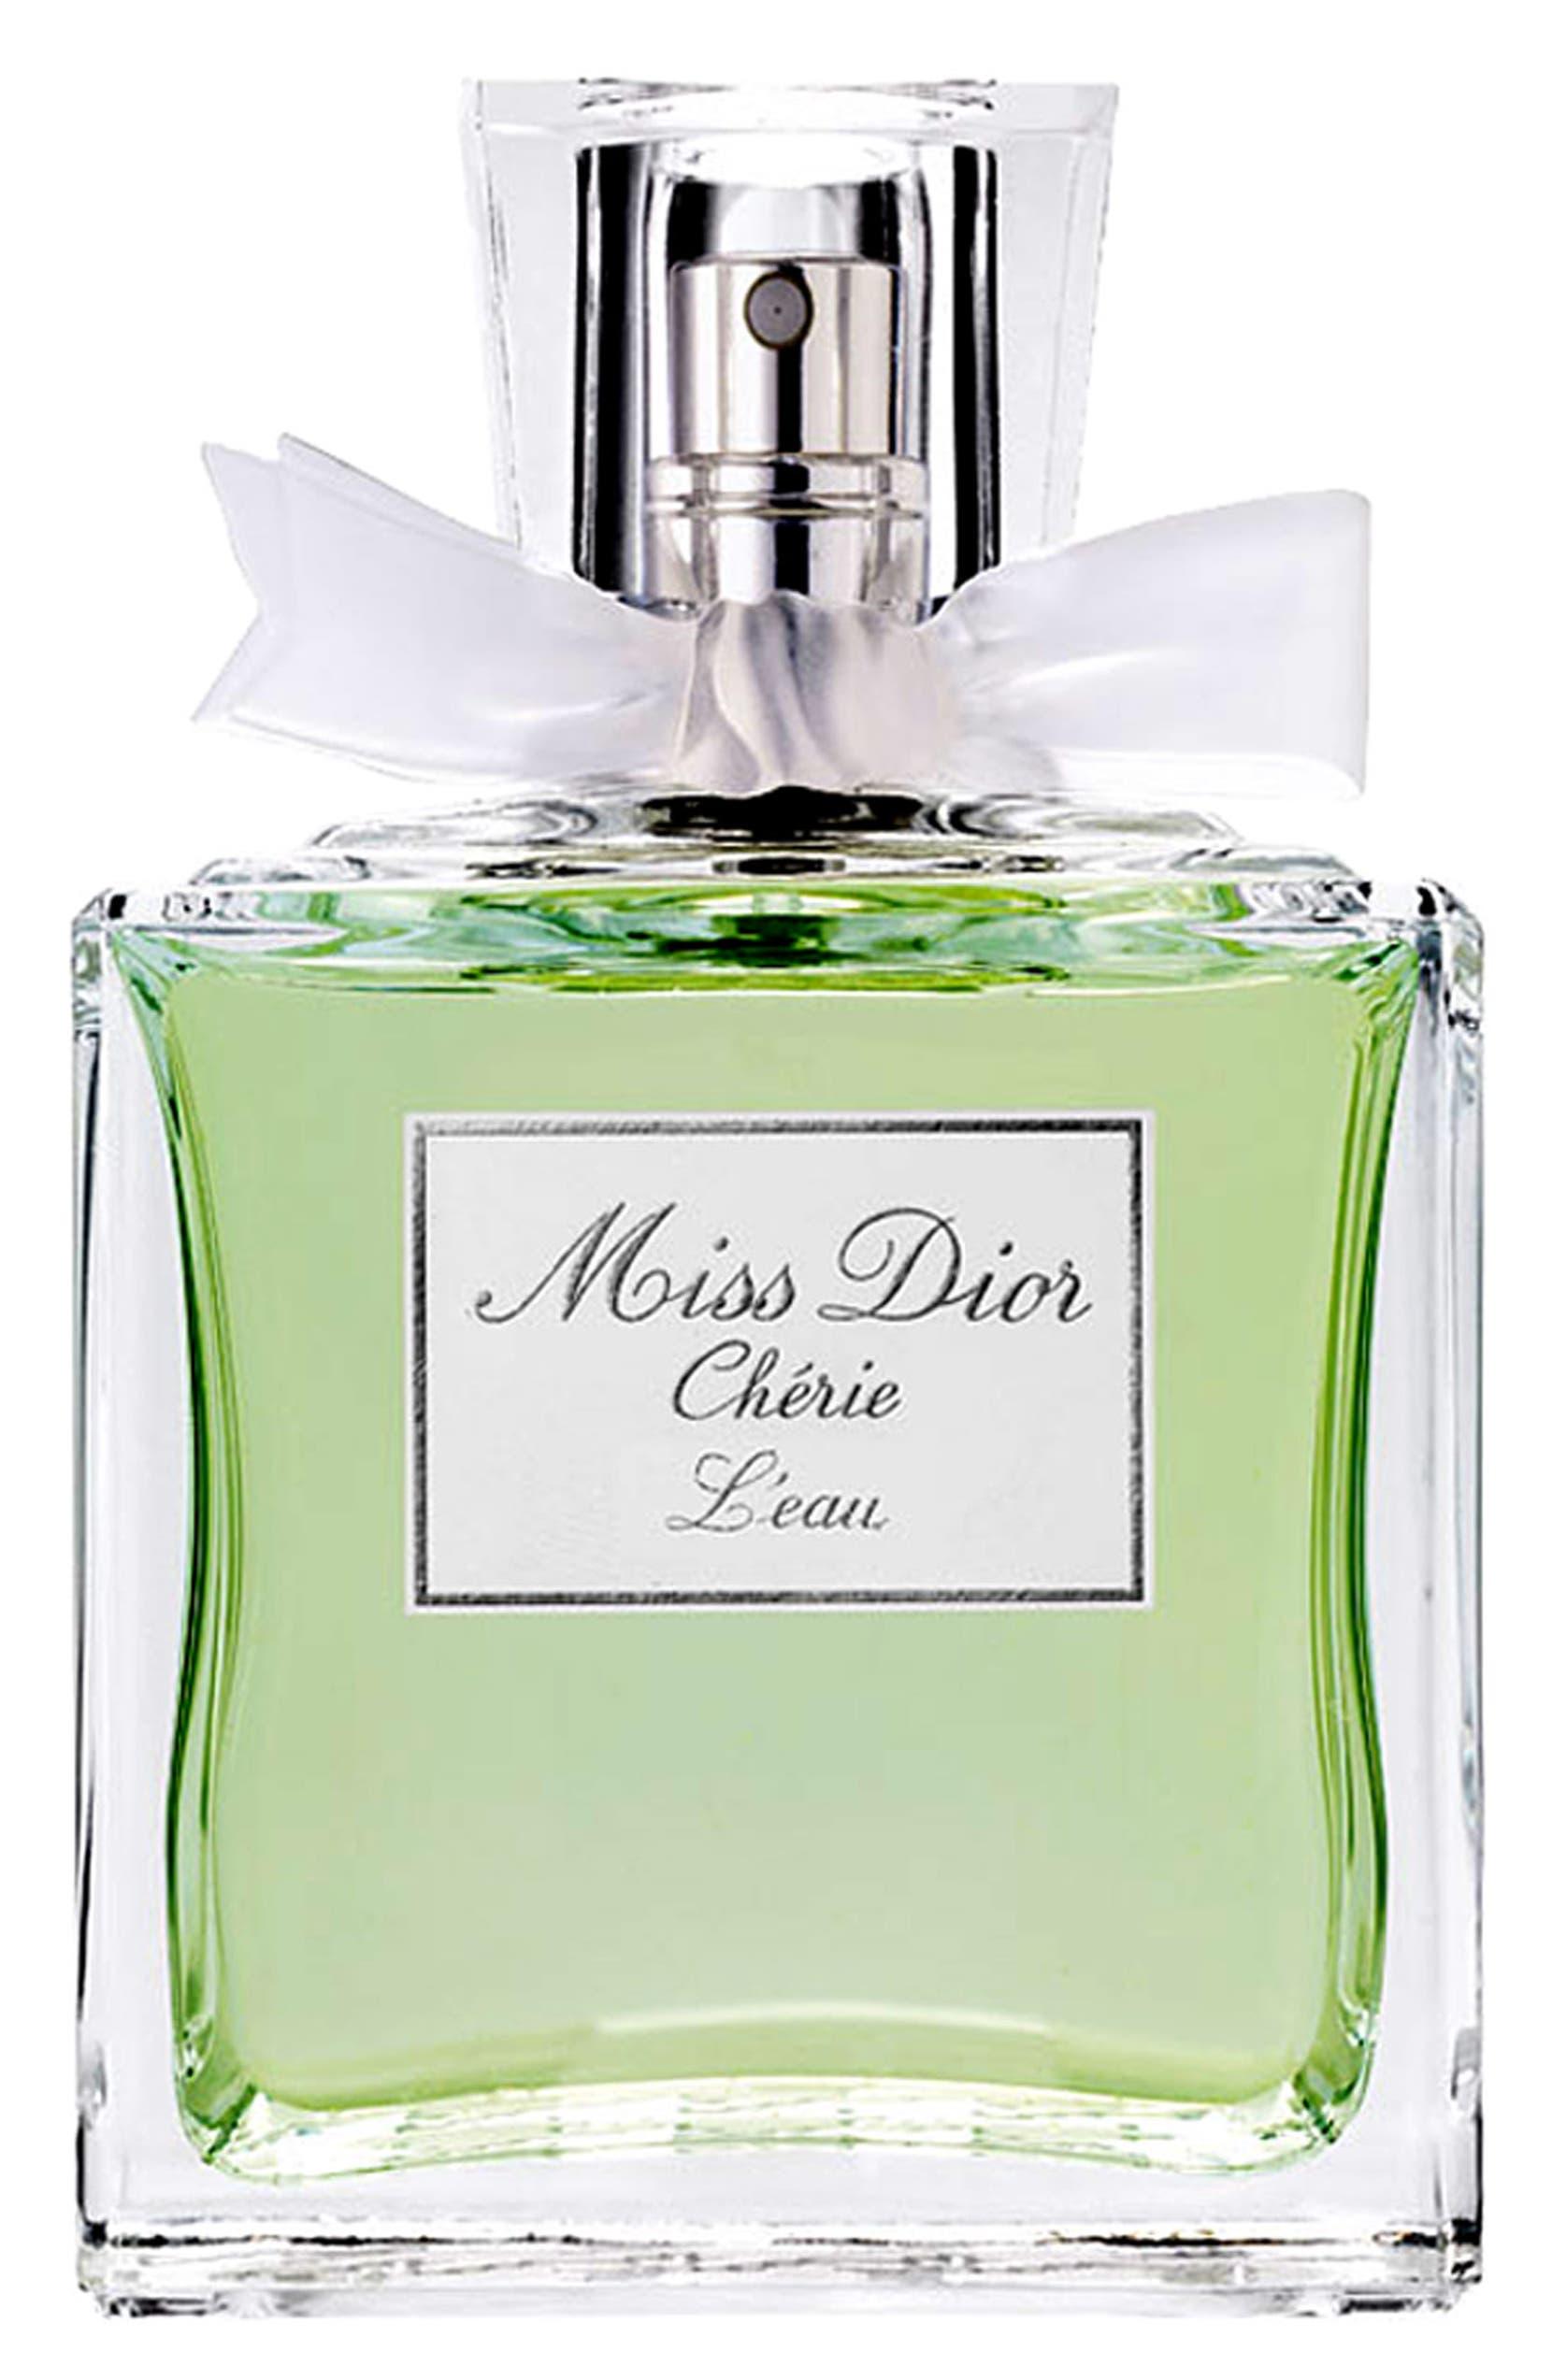 Dior Dior  Miss Dior Cherie  L Eau Eau de Toilette Spray  11f7504062602